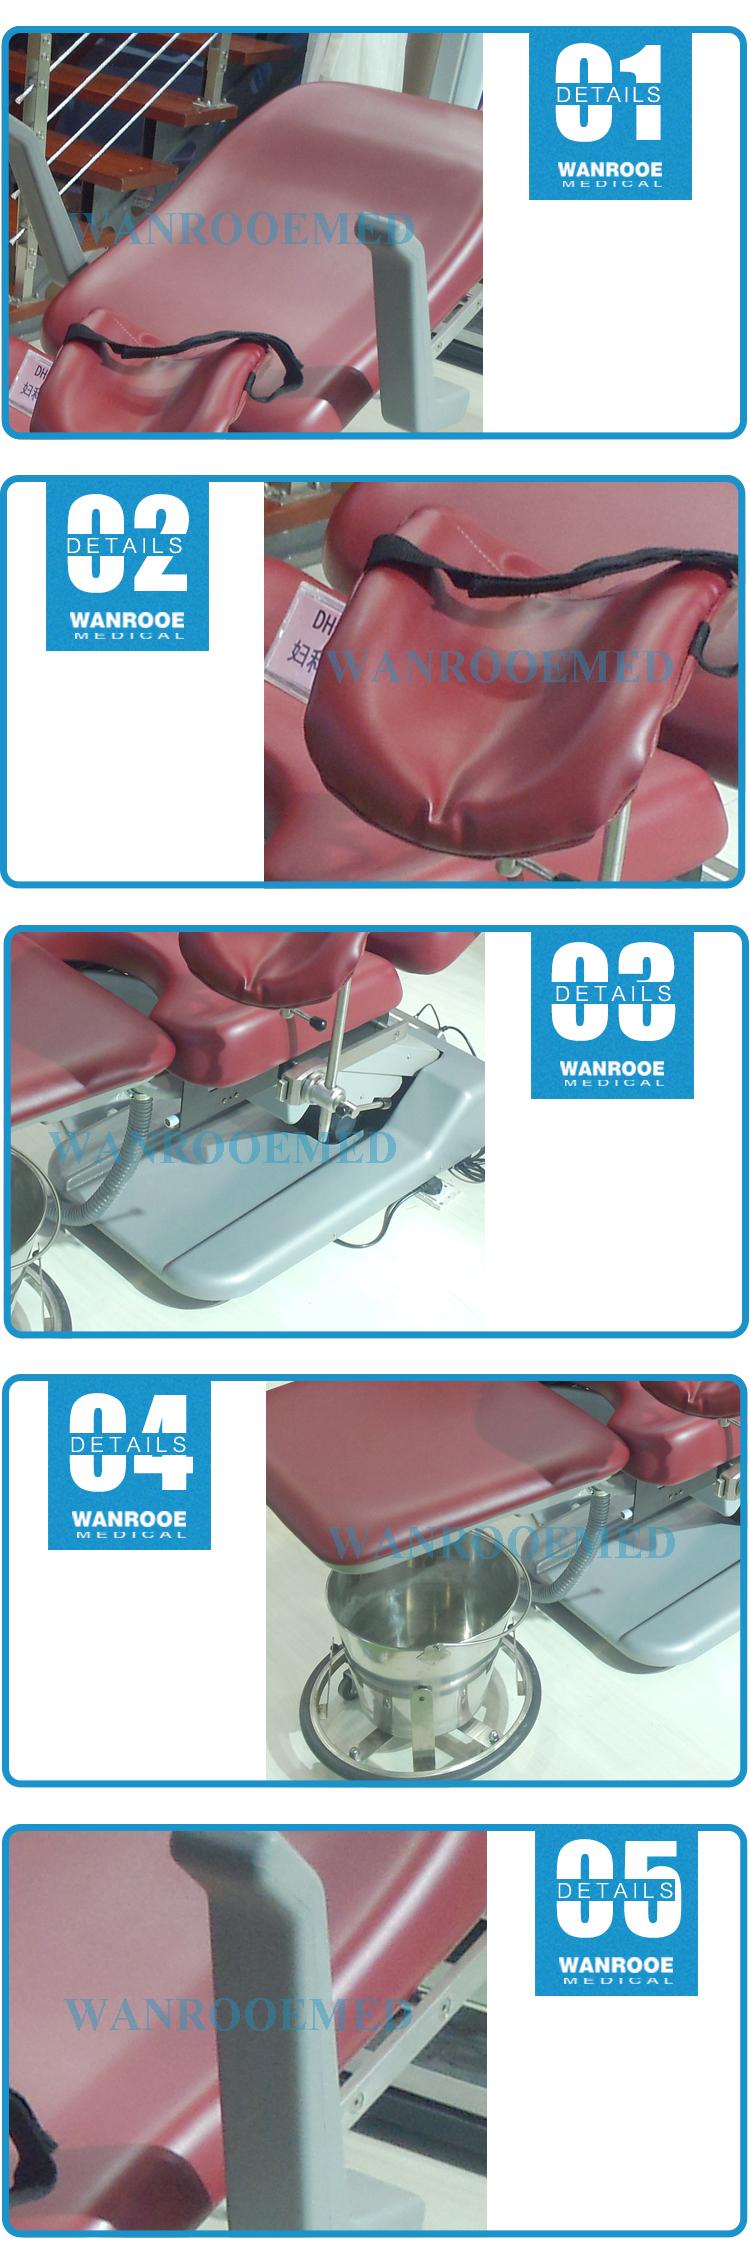 Obstetrics Examination Table, Gynecological Chair, Obstetrics Chair, Electric Obstetrics Table, Gynecological Examination Chair